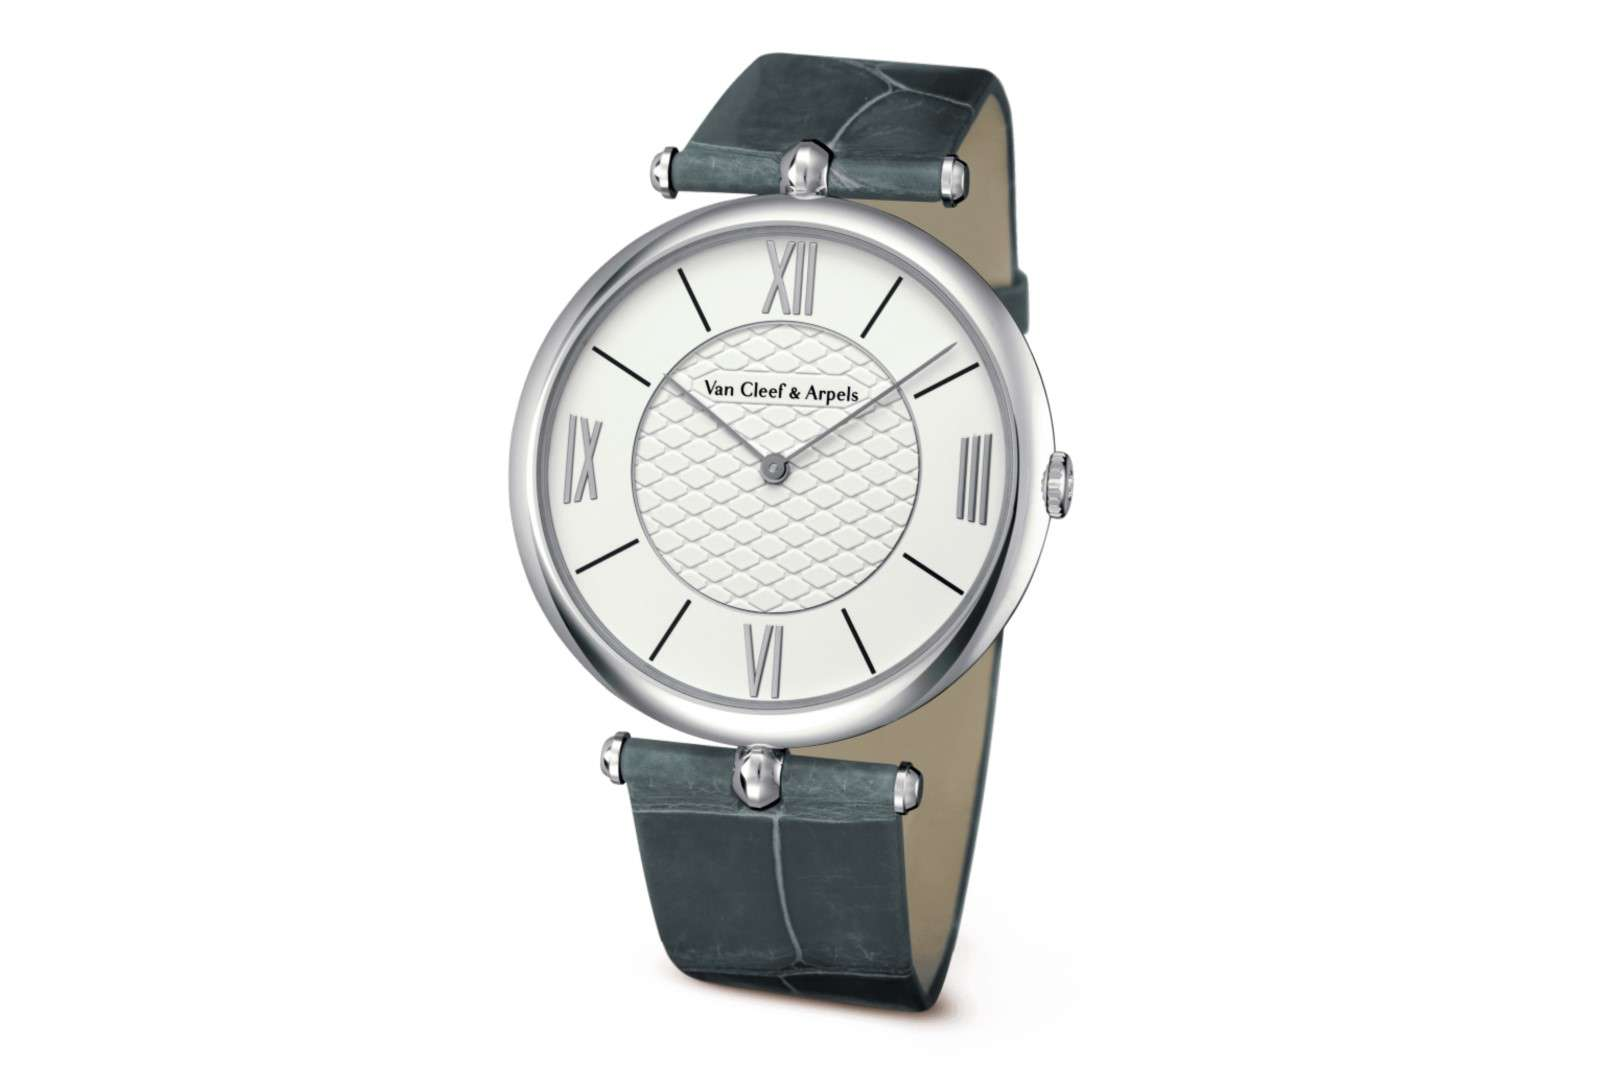 Van Cleef & Arpels Pierre Arpels dress watch